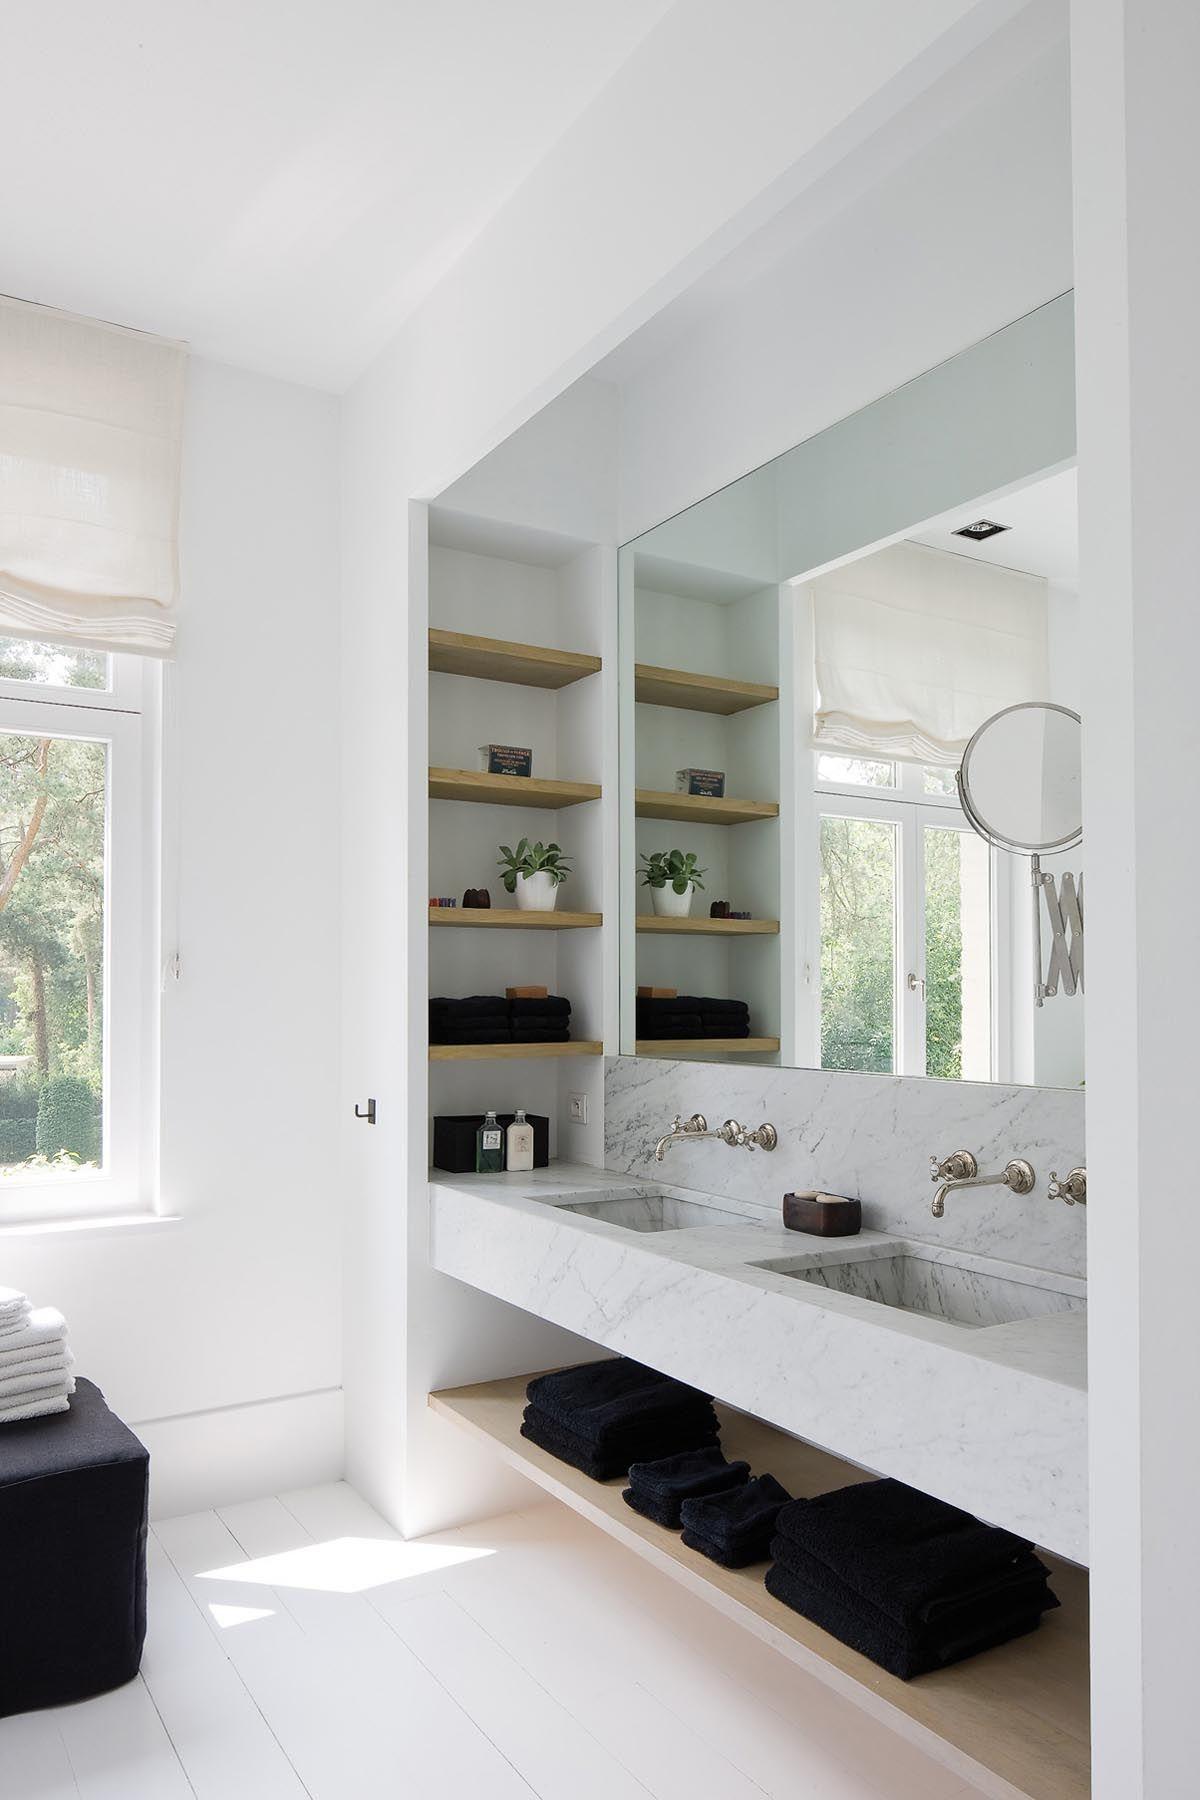 Scandinavian bathroom designs white wall tiles grey floor - Hornacina bano ...